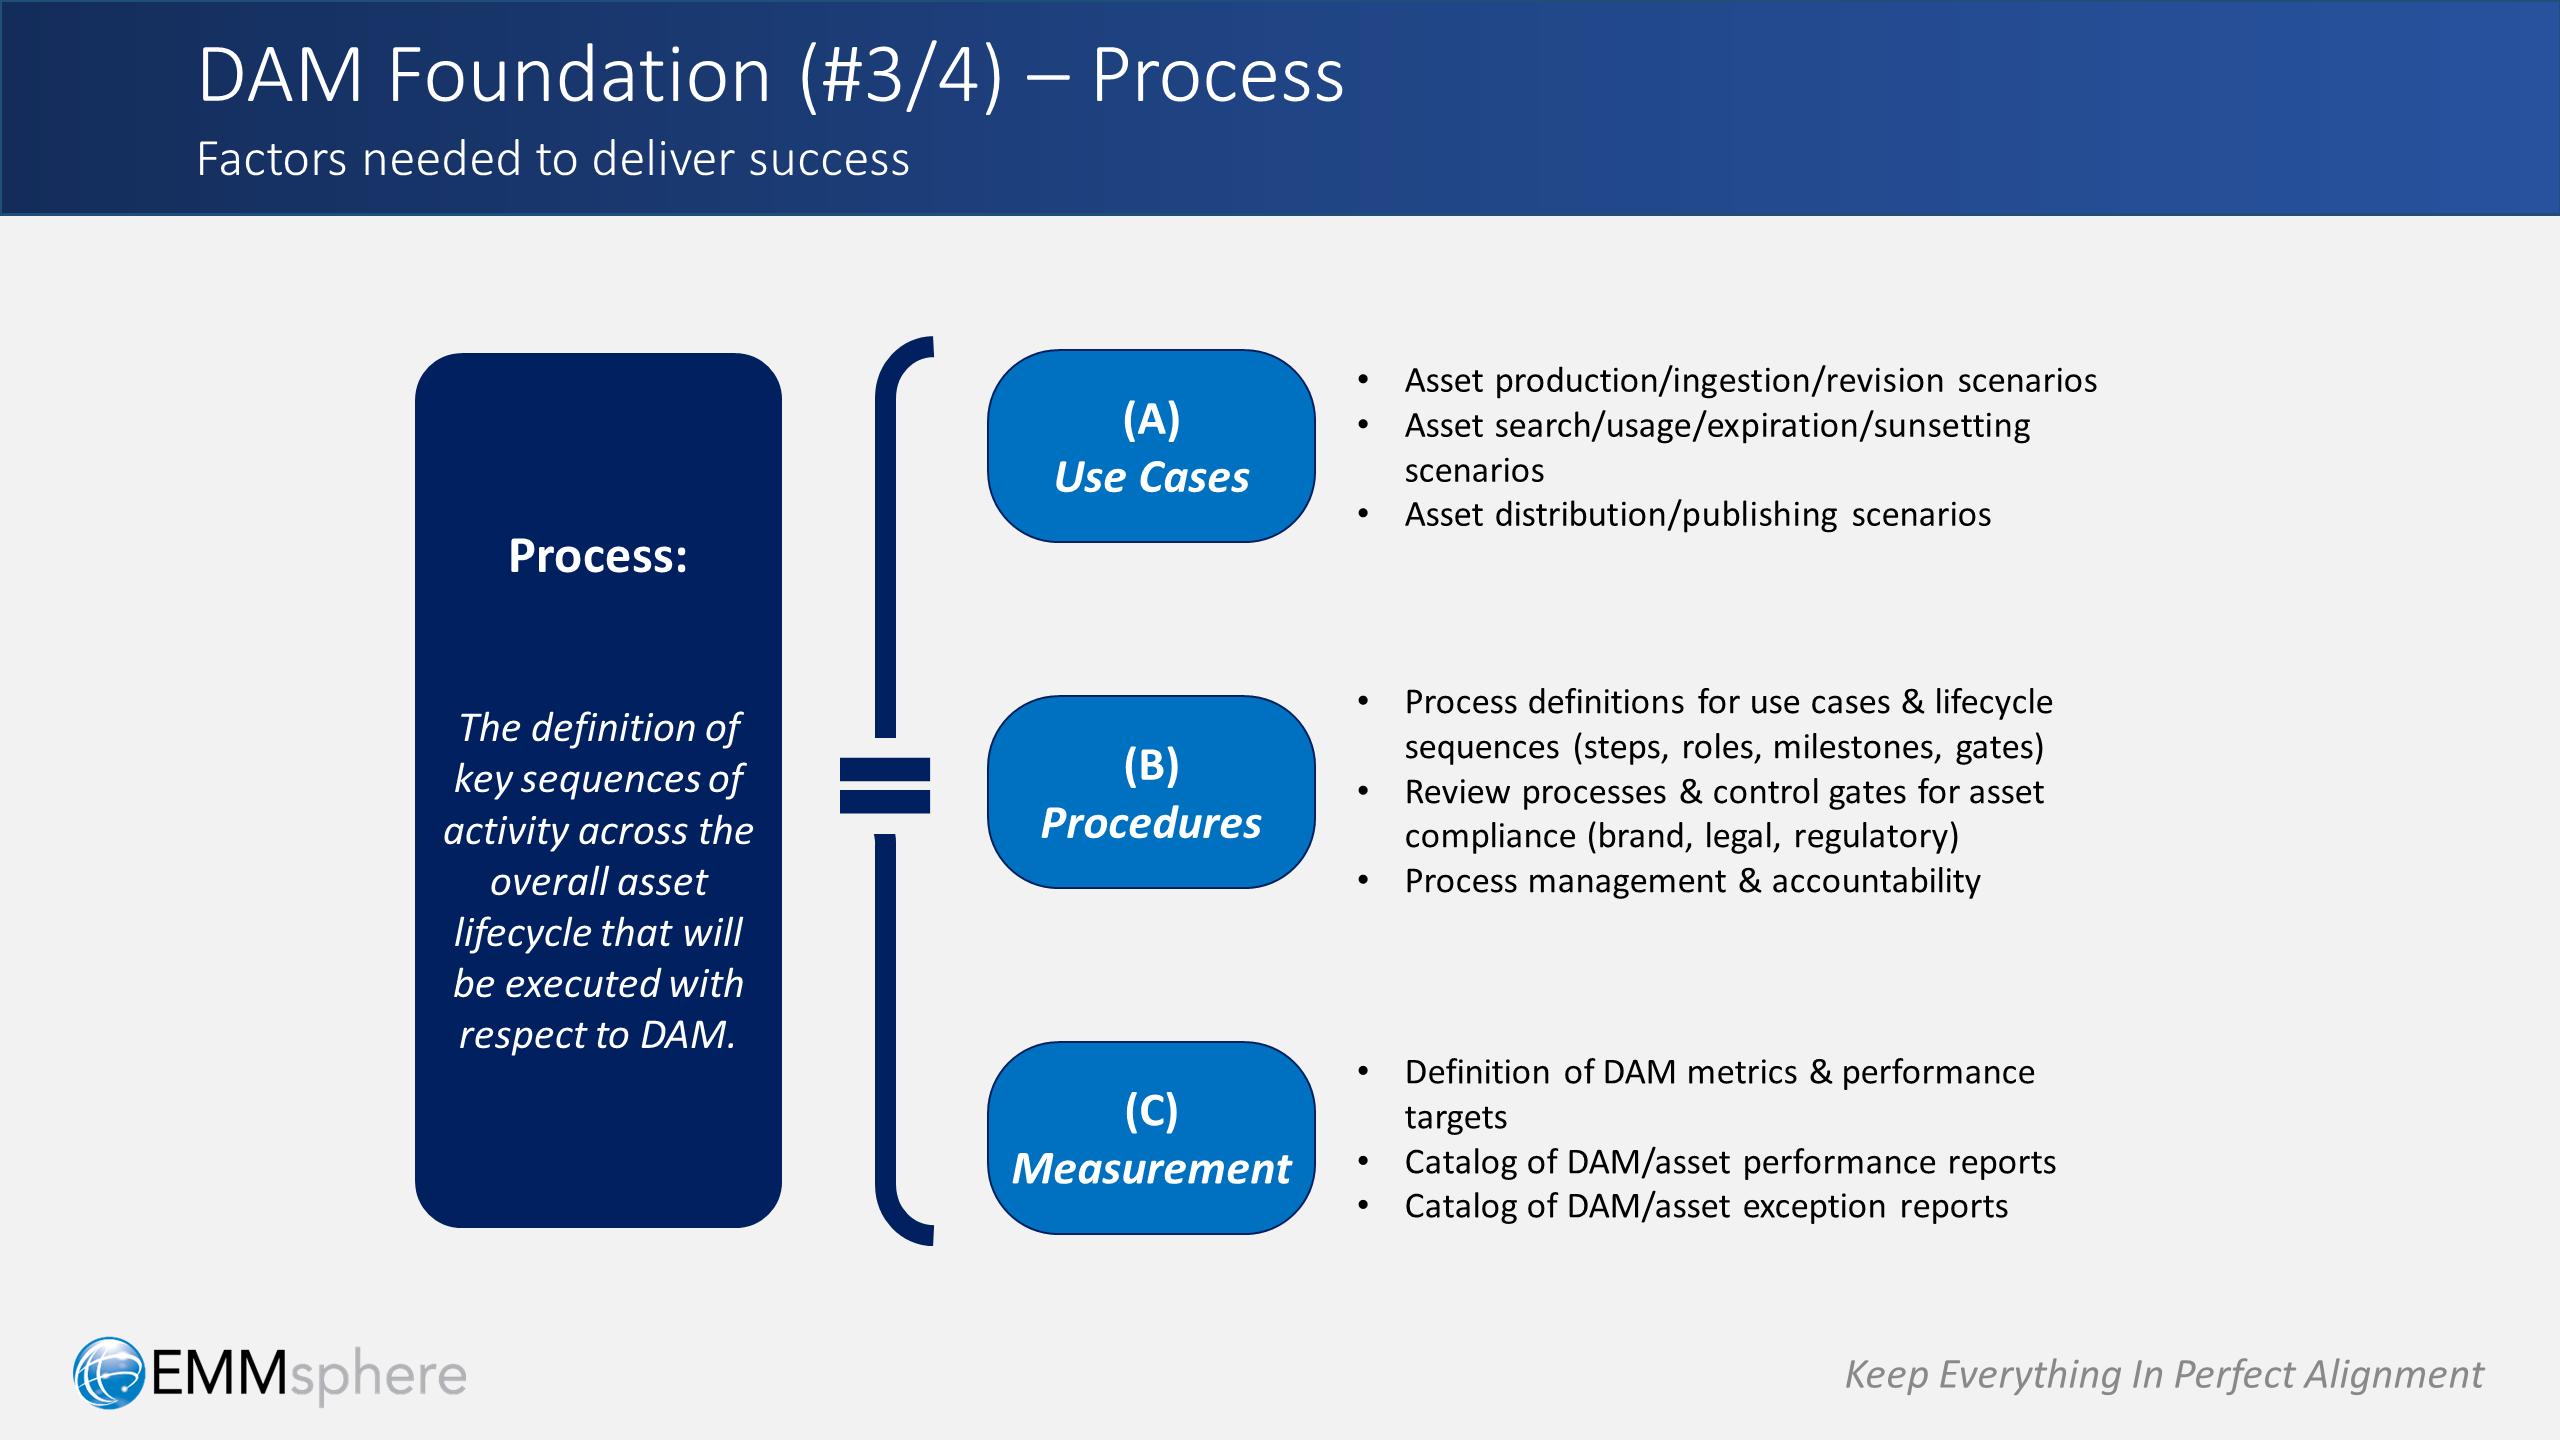 DAM Perspectives Part 4 - Process